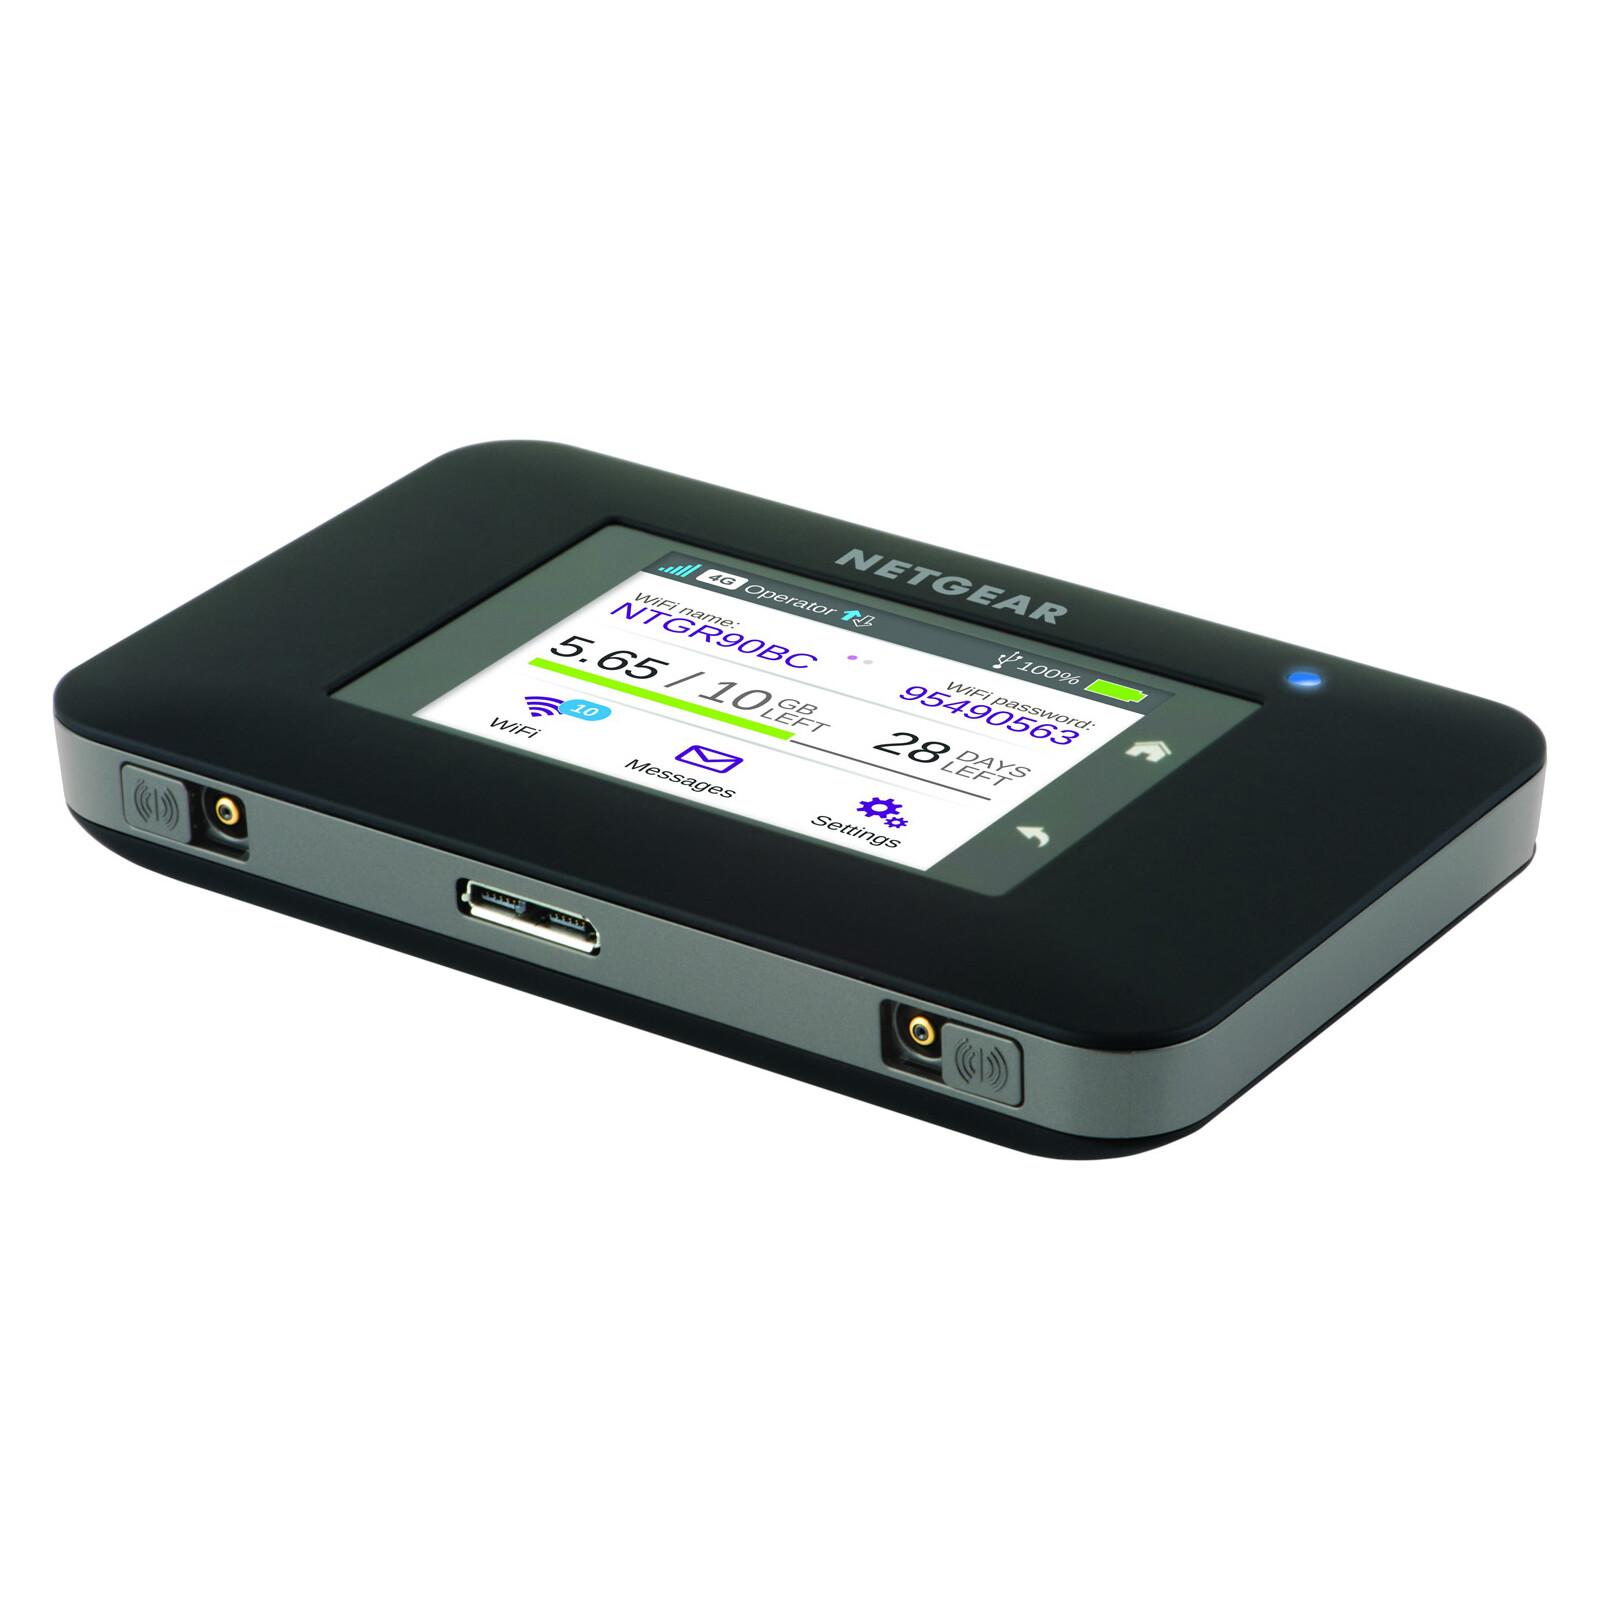 Netgear Aircard 790 Mobile Hotspot